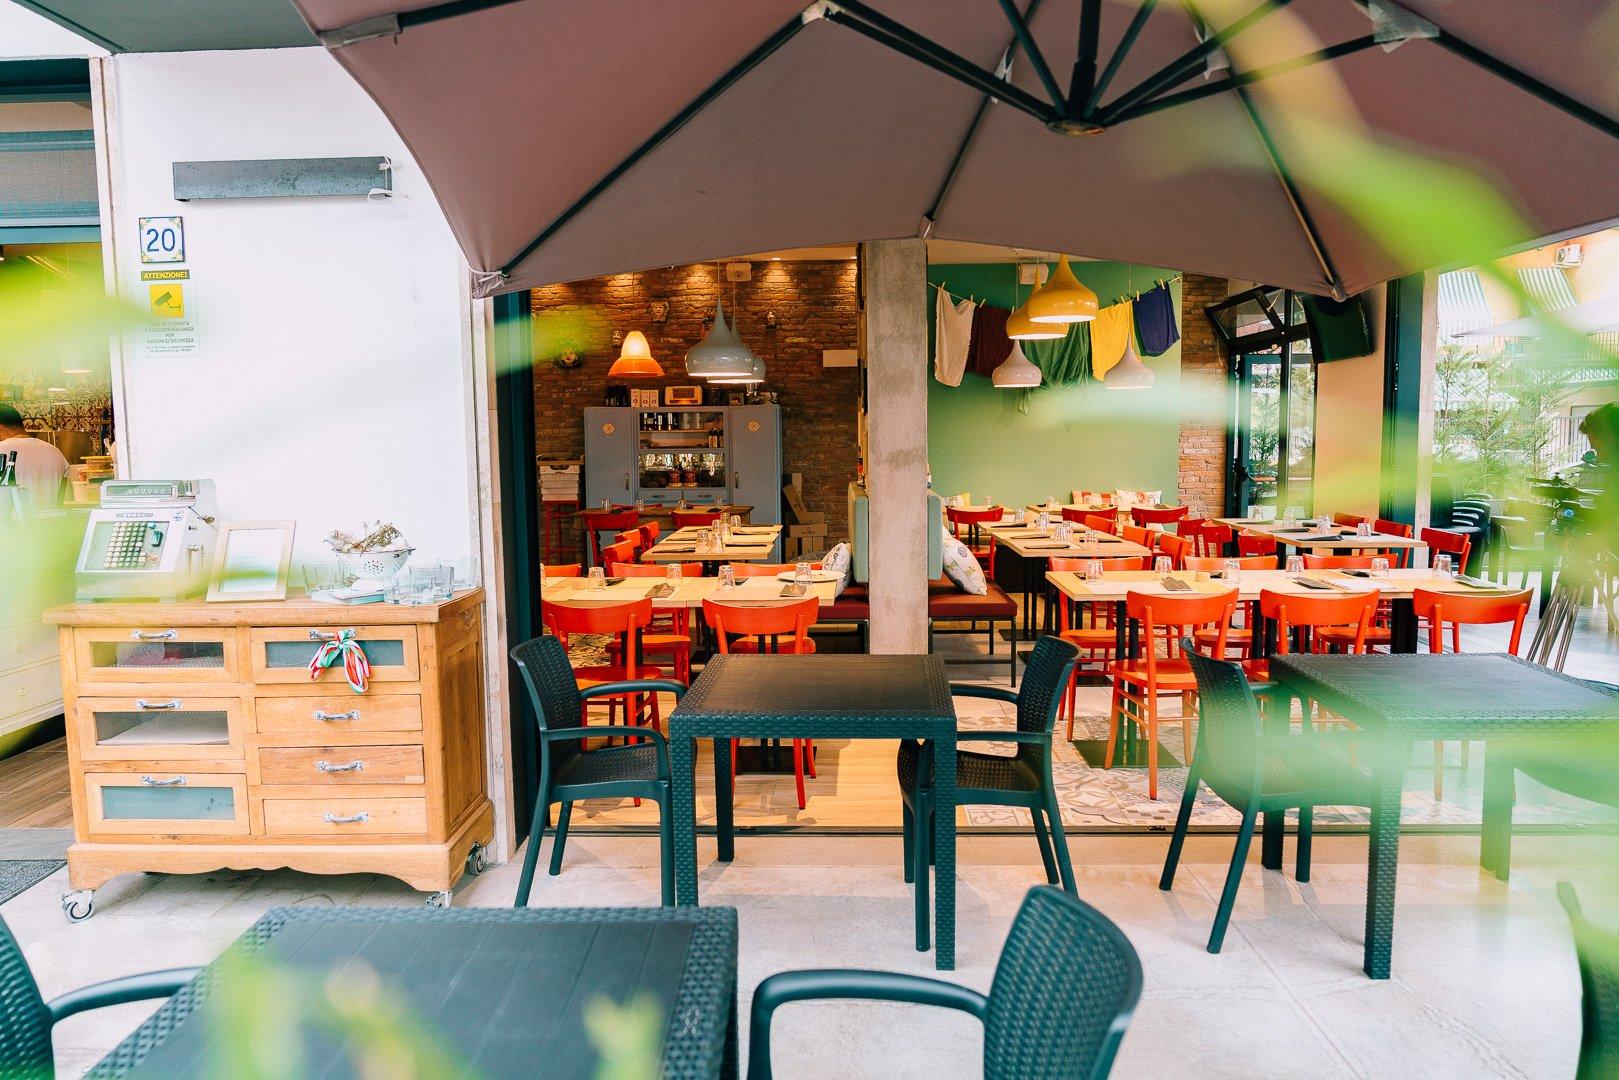 Pizzeria la Mafaldina - veranda